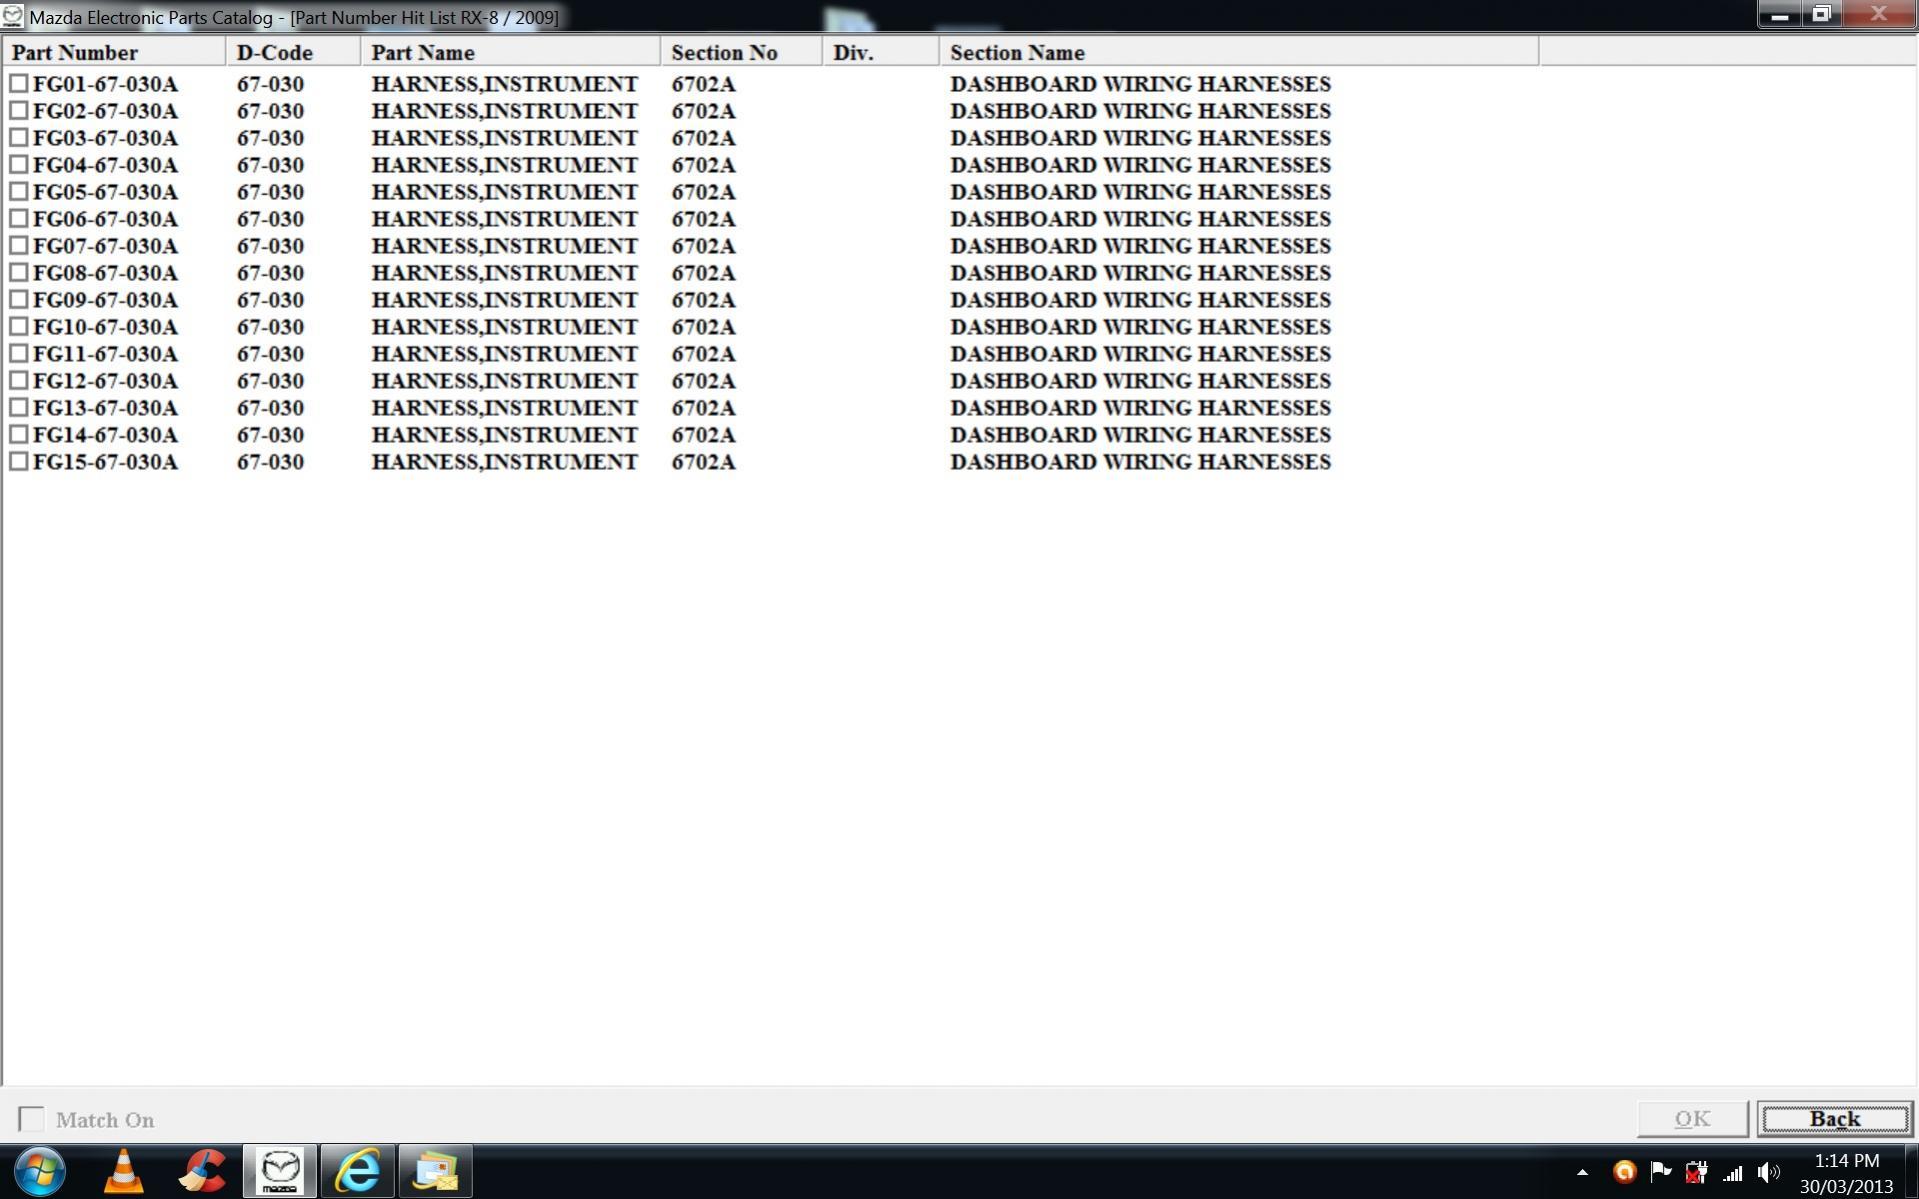 Series Ii Mazda Oe Parts Number Listings Complete